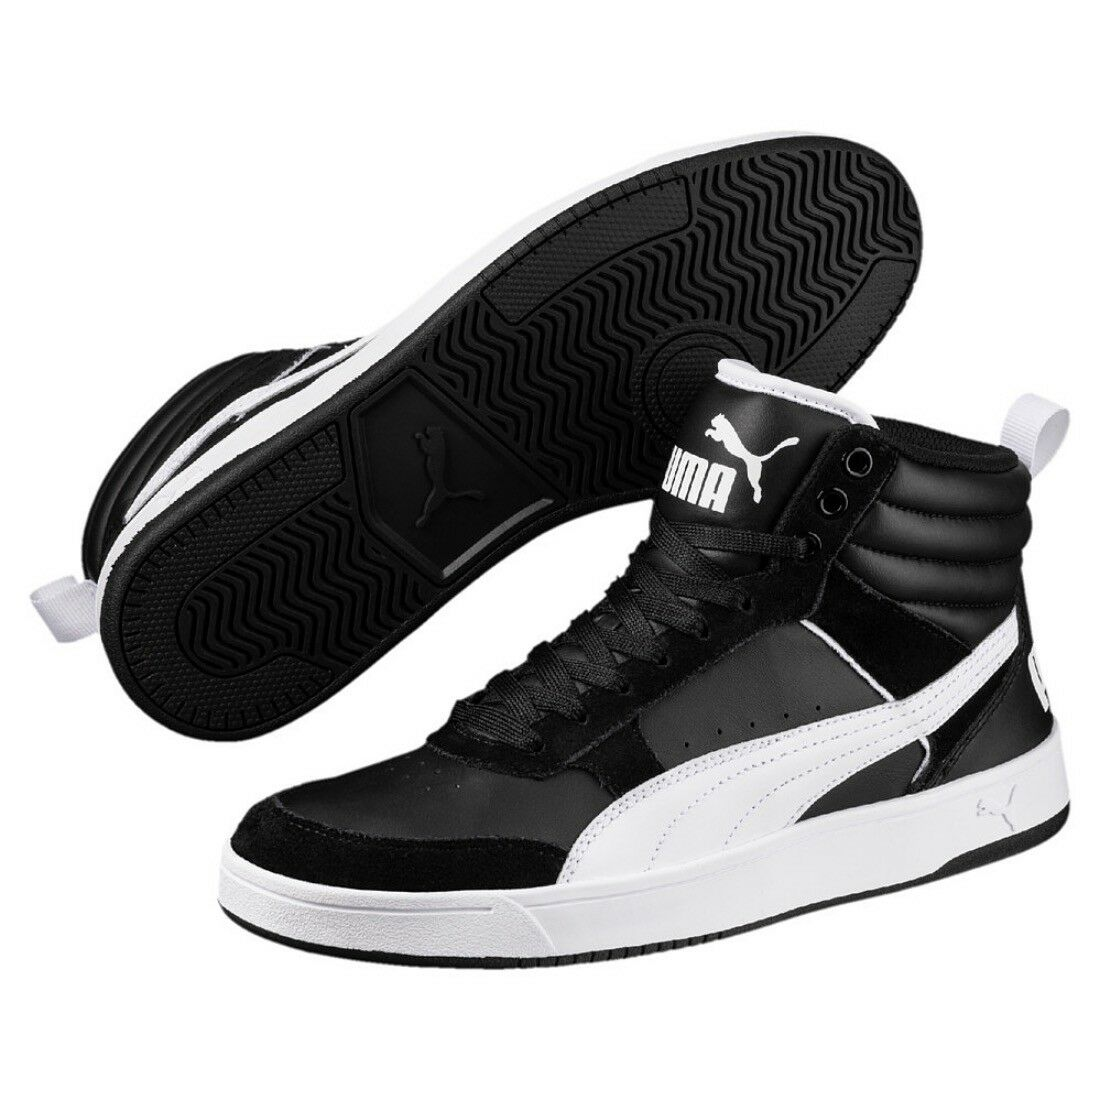 Puma Rebond Street v2 v2 Street MID Chaussures Basket 363715 28da41